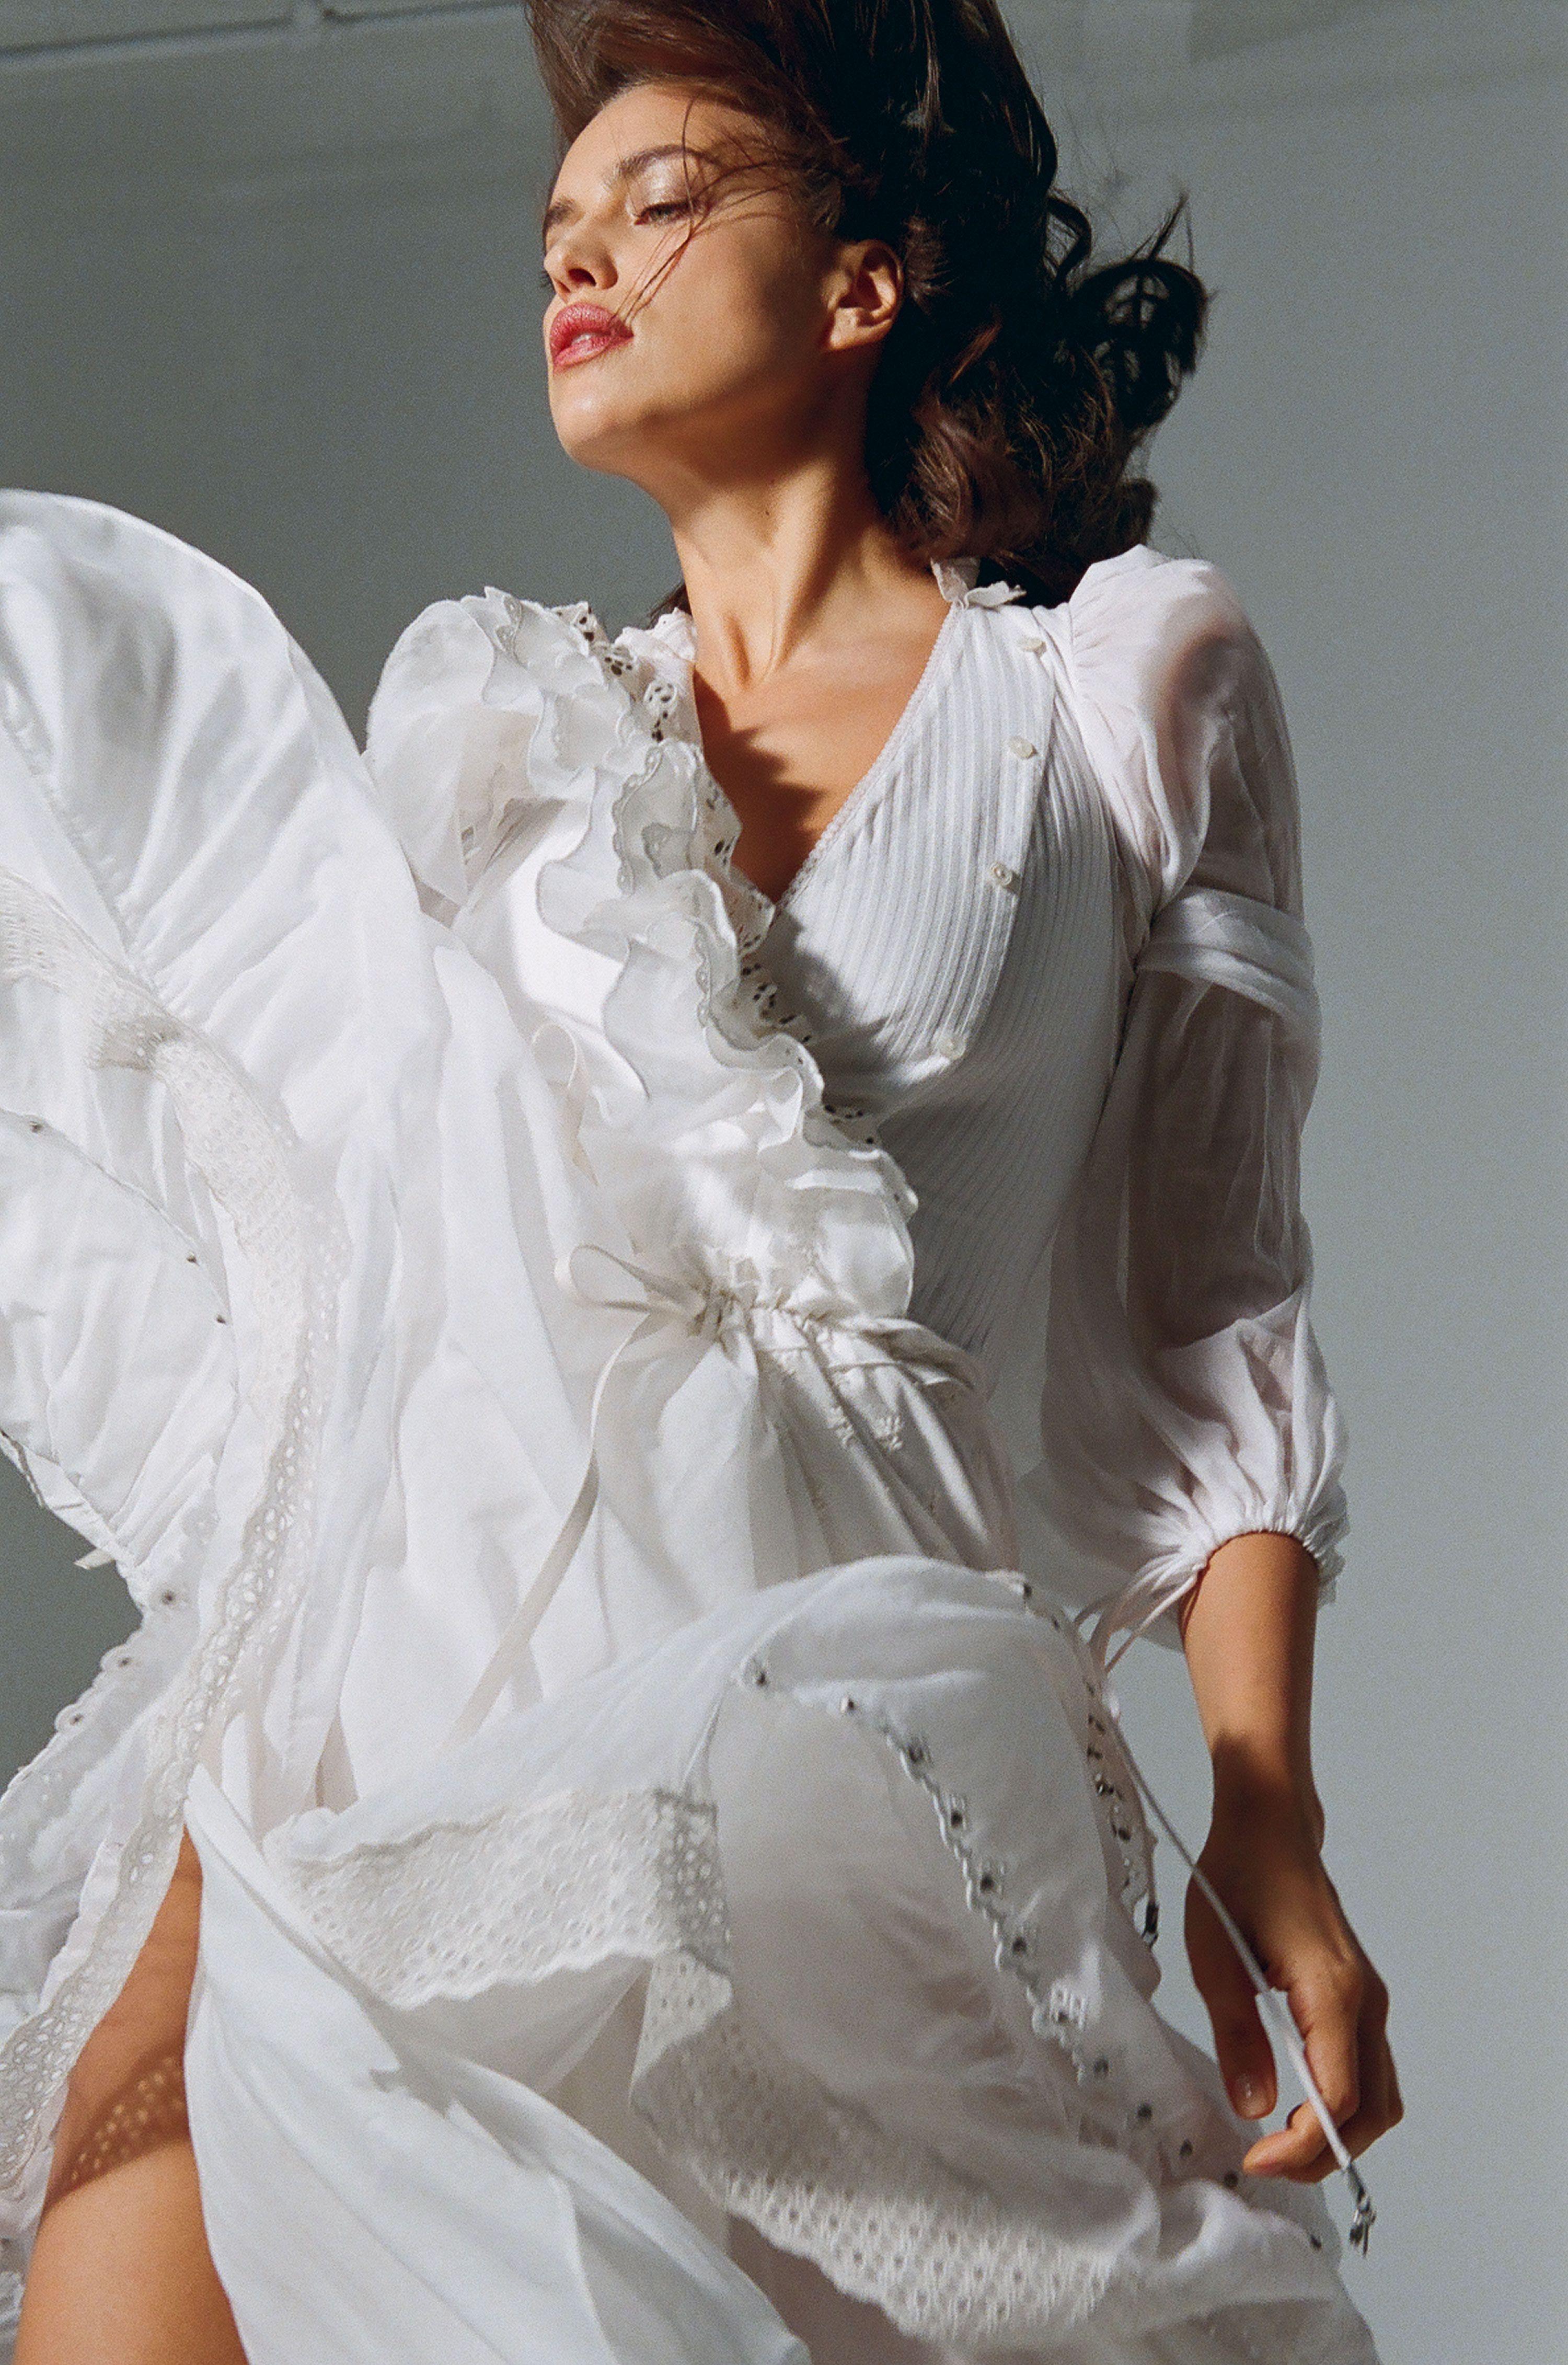 New York Fashion Week Blows Irina Shayk Away